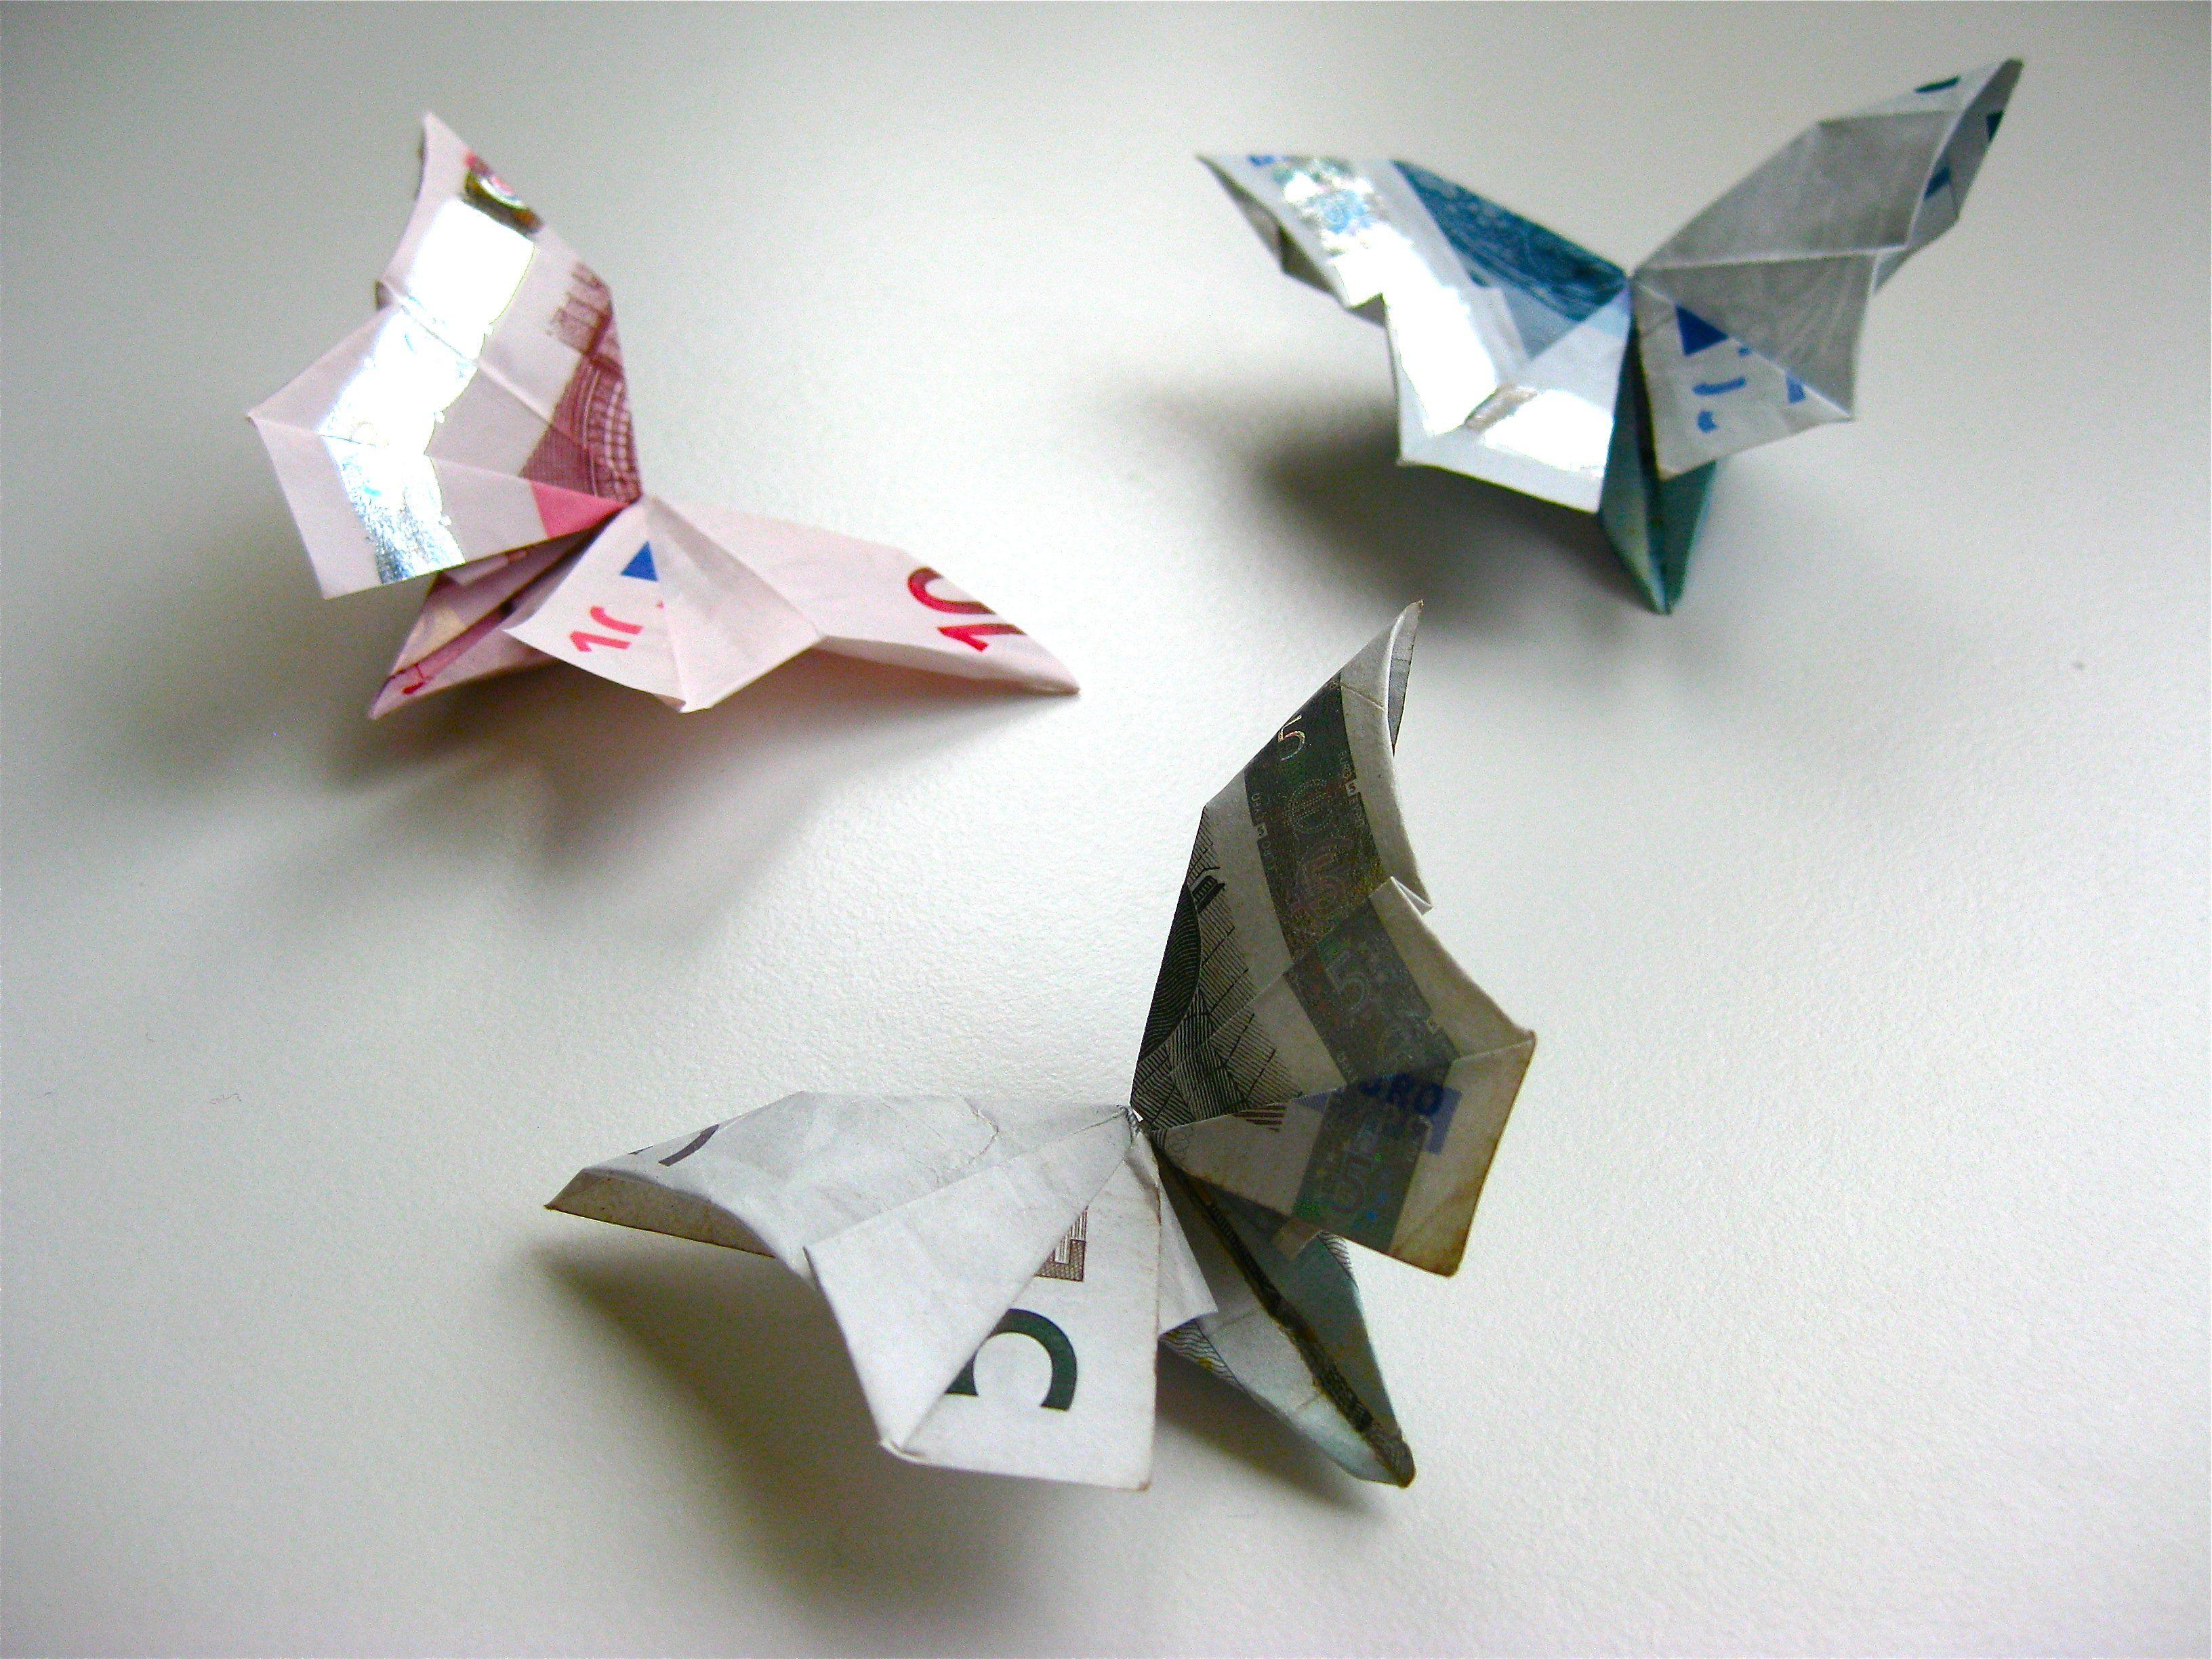 Origami Geldschein Schmetterling Video Anleitung Origami, Papercraft and Scrapbook